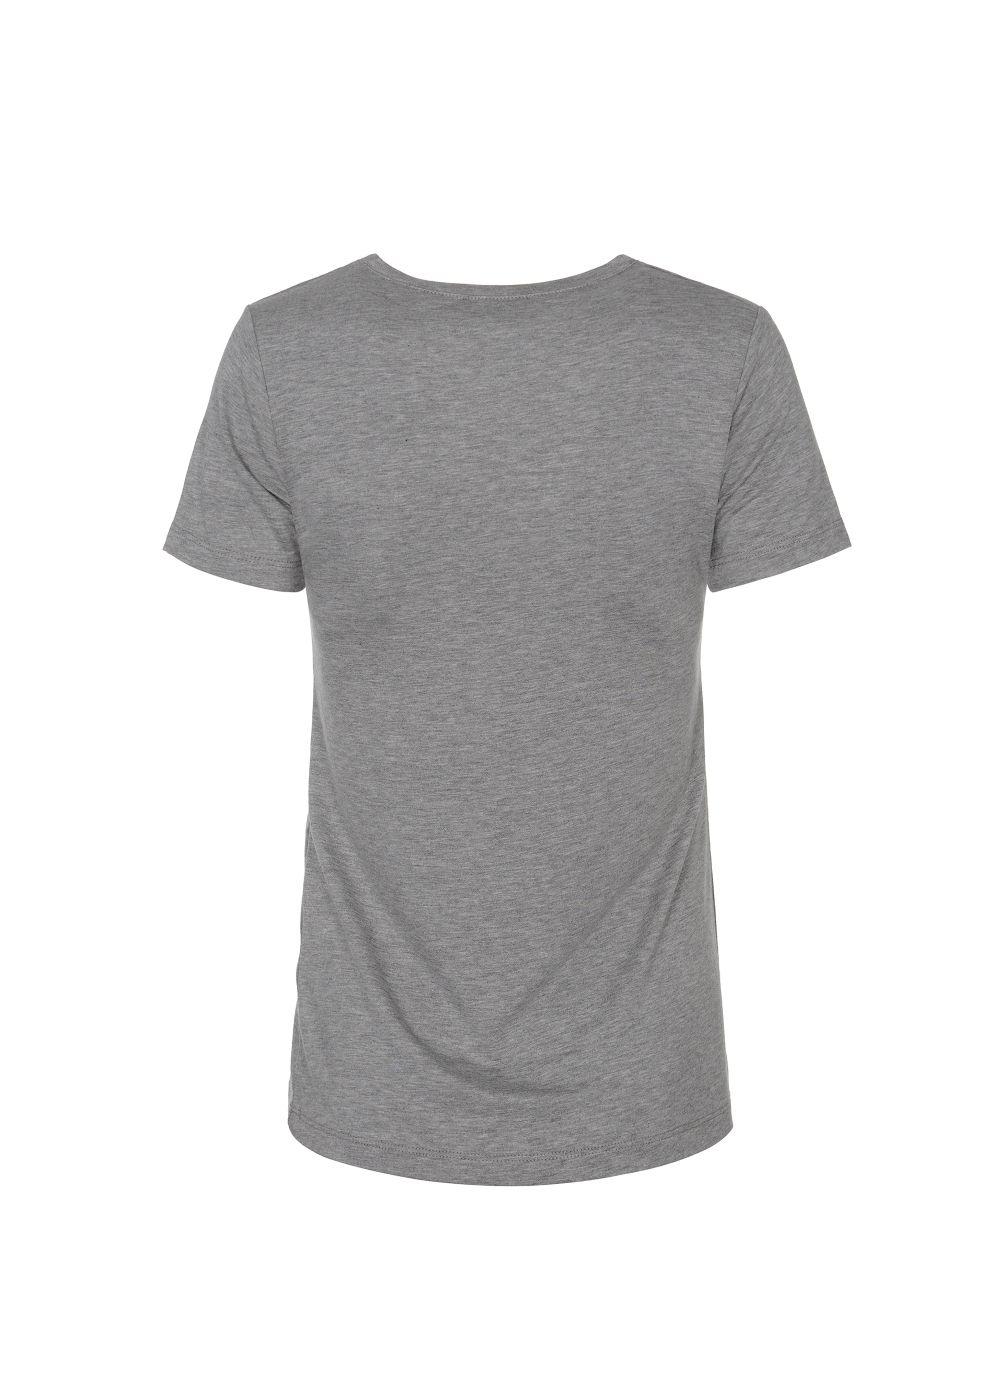 T-shirt damski TSHDT-0030-91(W19)